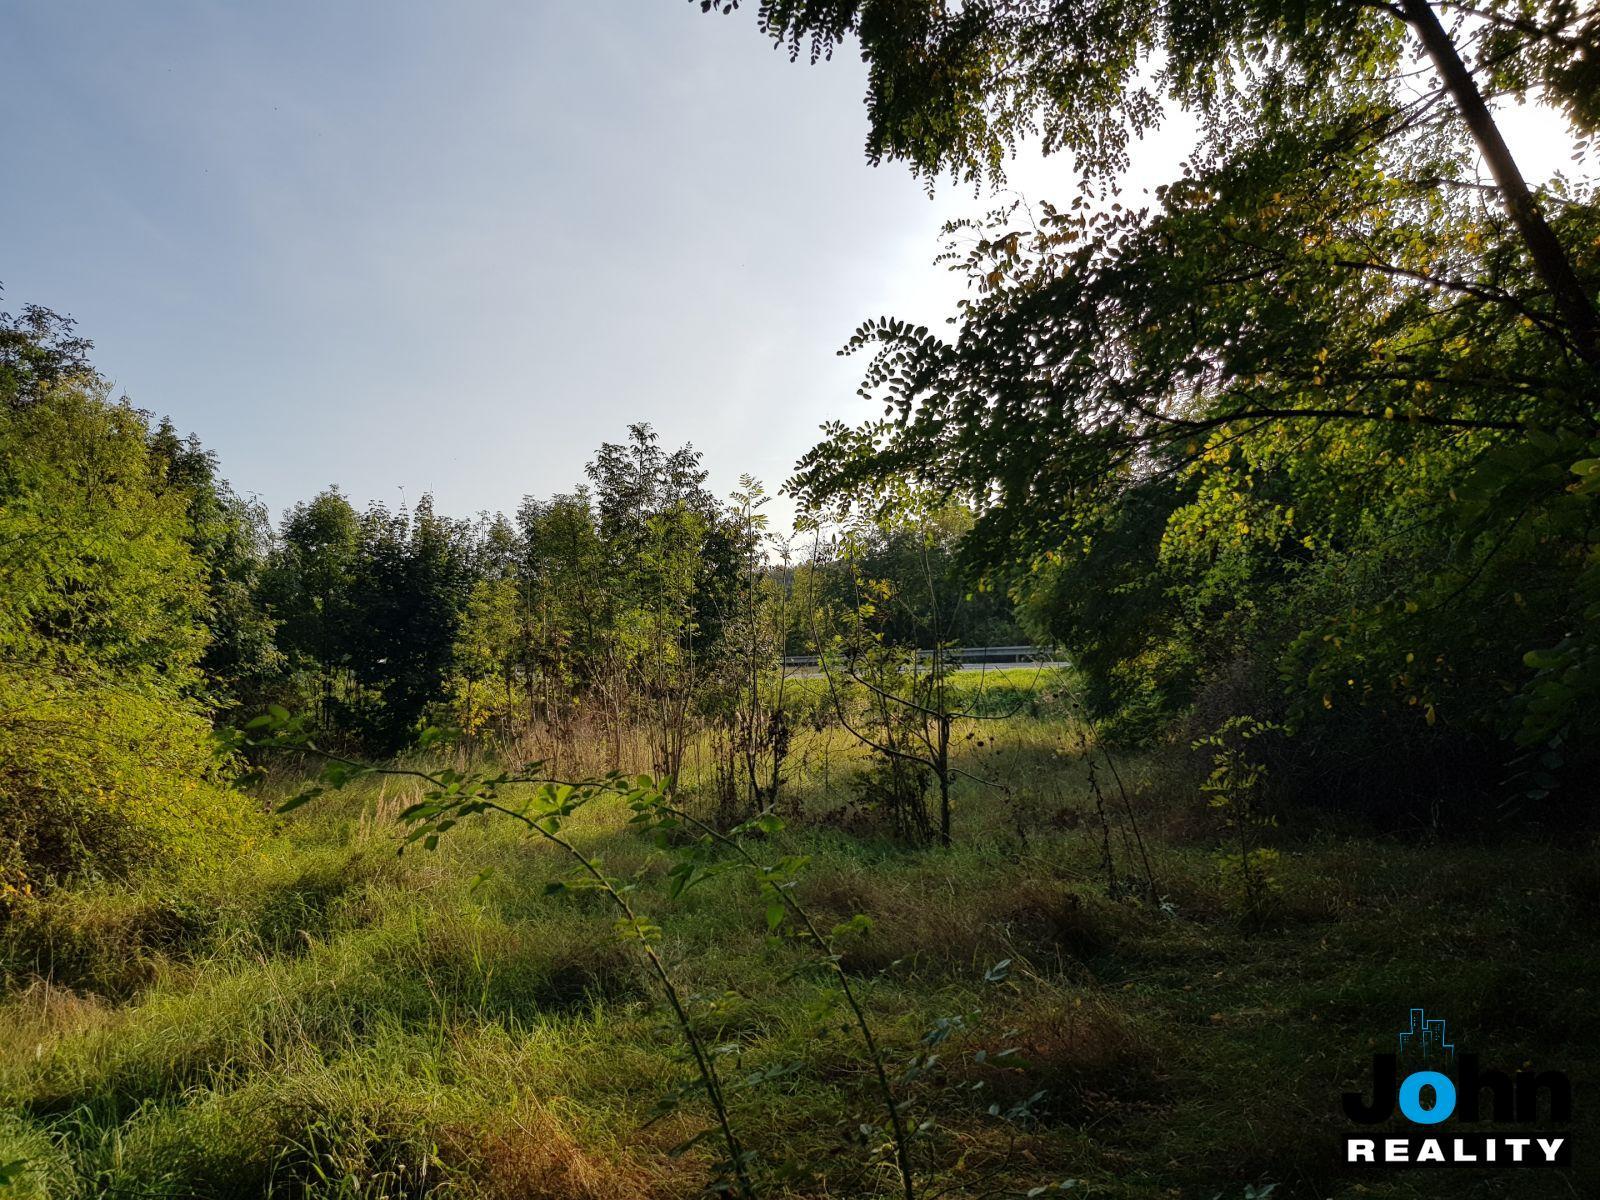 Prodej pozemku 1650 m2, Korozluky, okr. Most